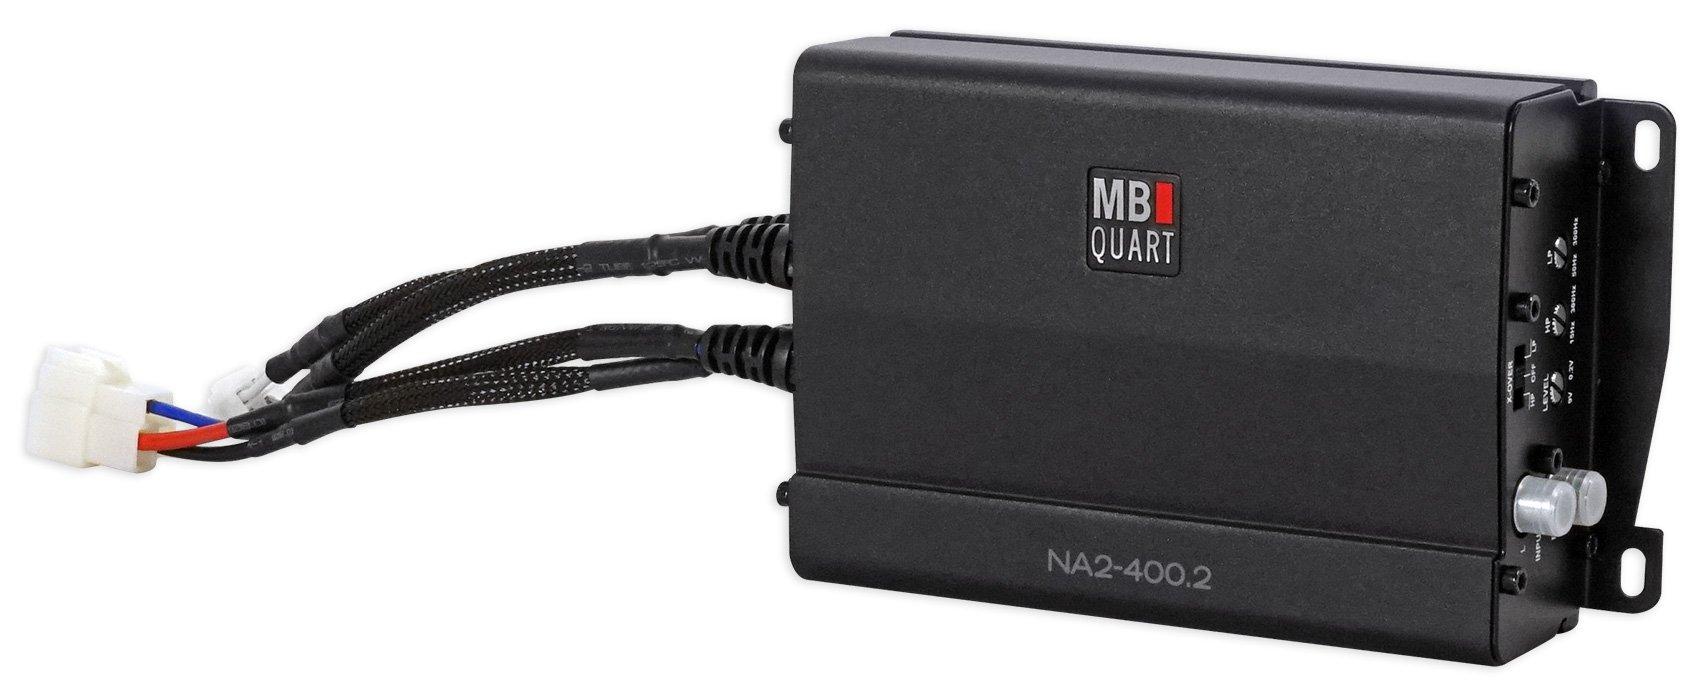 MB QUART NA2-400.2 400w 2-Channel Amplifier Amp For Polaris/ATV/UTV/RZR/CART by MB Quart (Image #2)